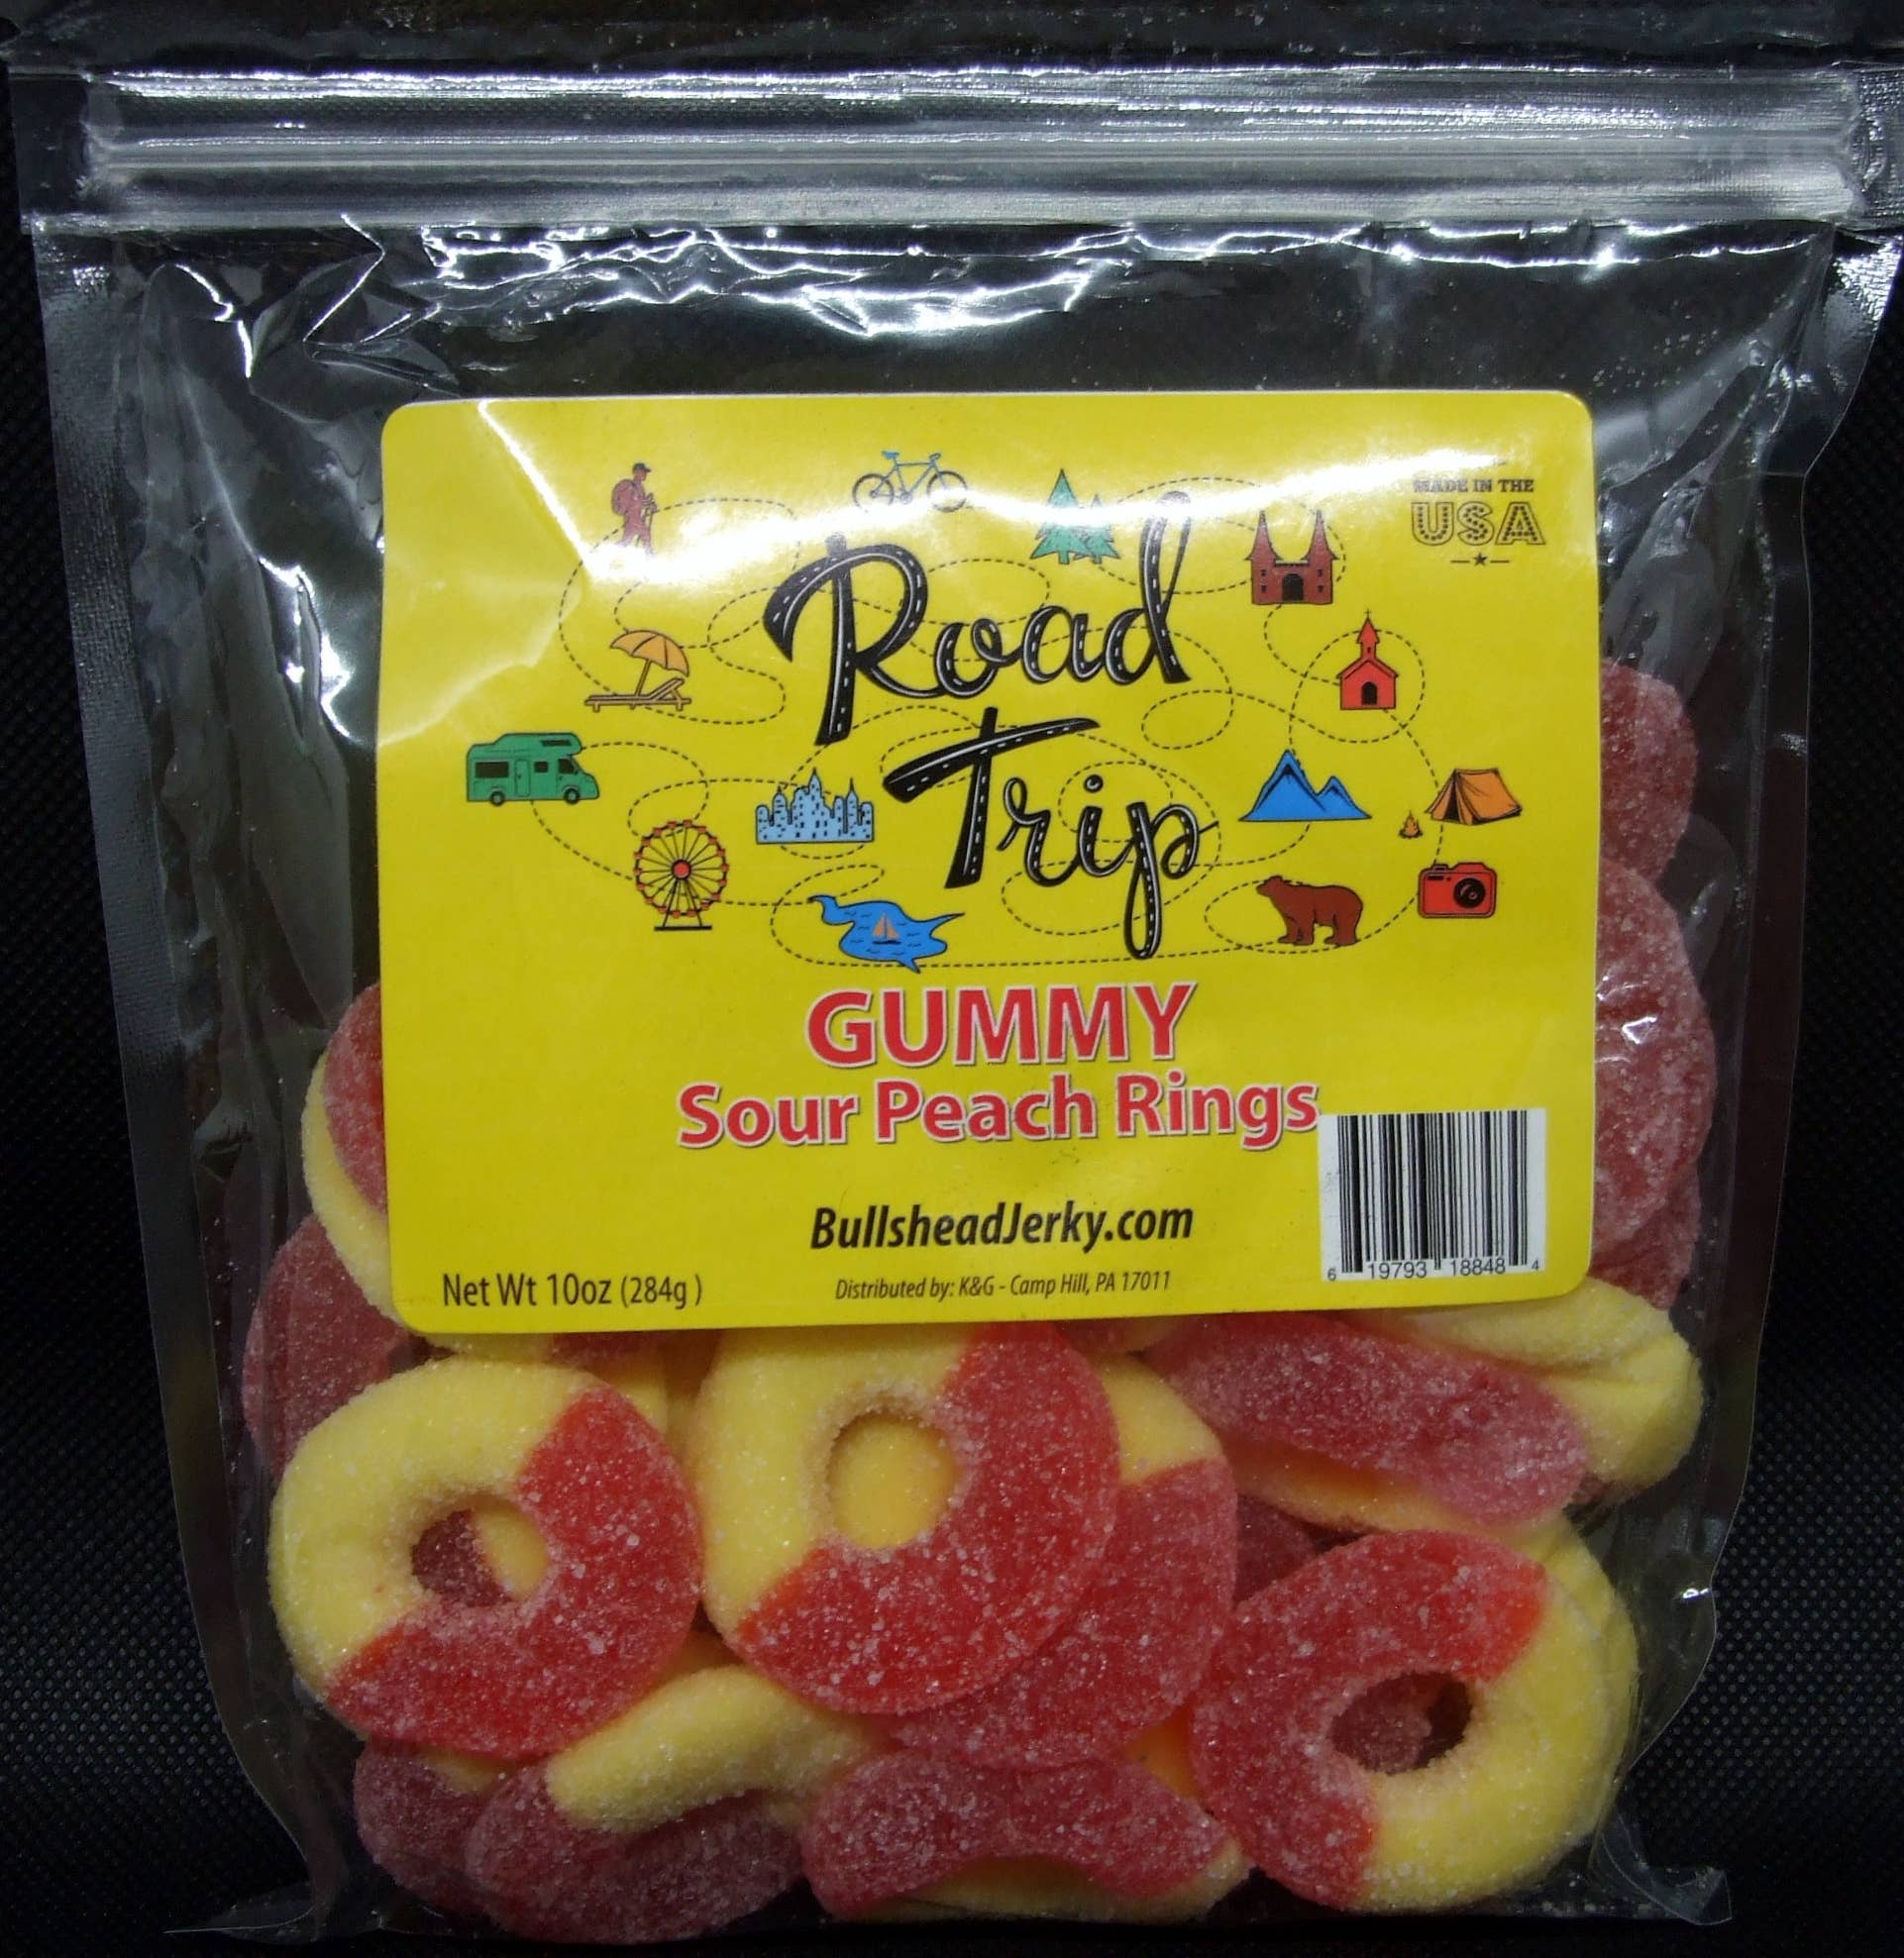 Gummy Sour Peach Rings 10 oz | Trada Marketplace